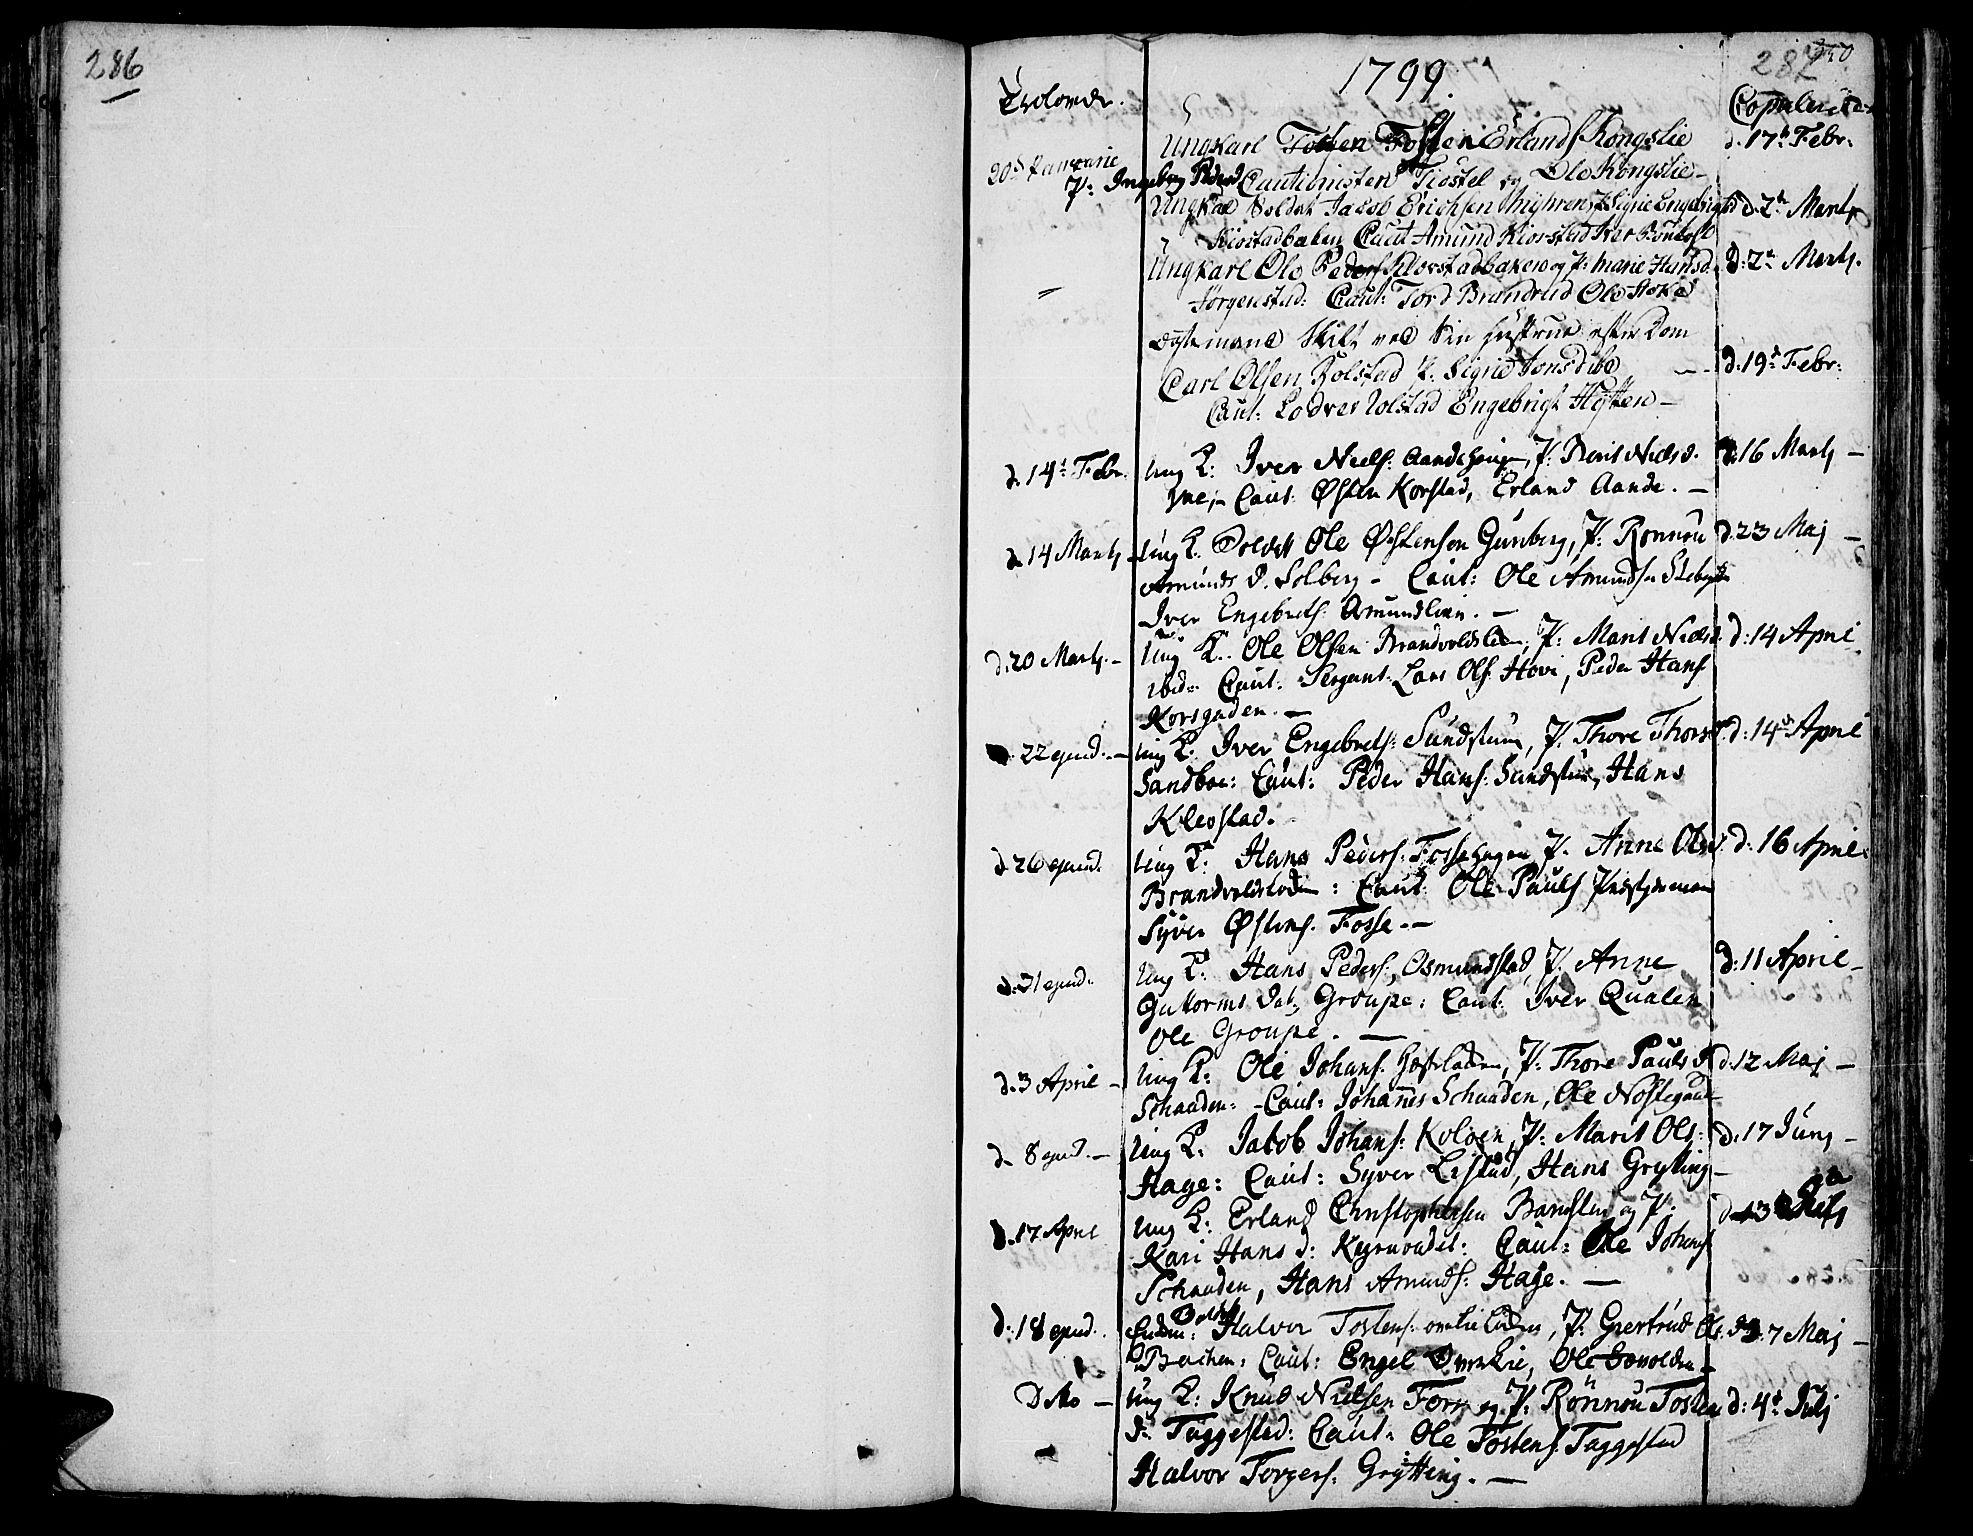 SAH, Fron prestekontor, H/Ha/Haa/L0001: Ministerialbok nr. 1, 1799-1816, s. 286-287